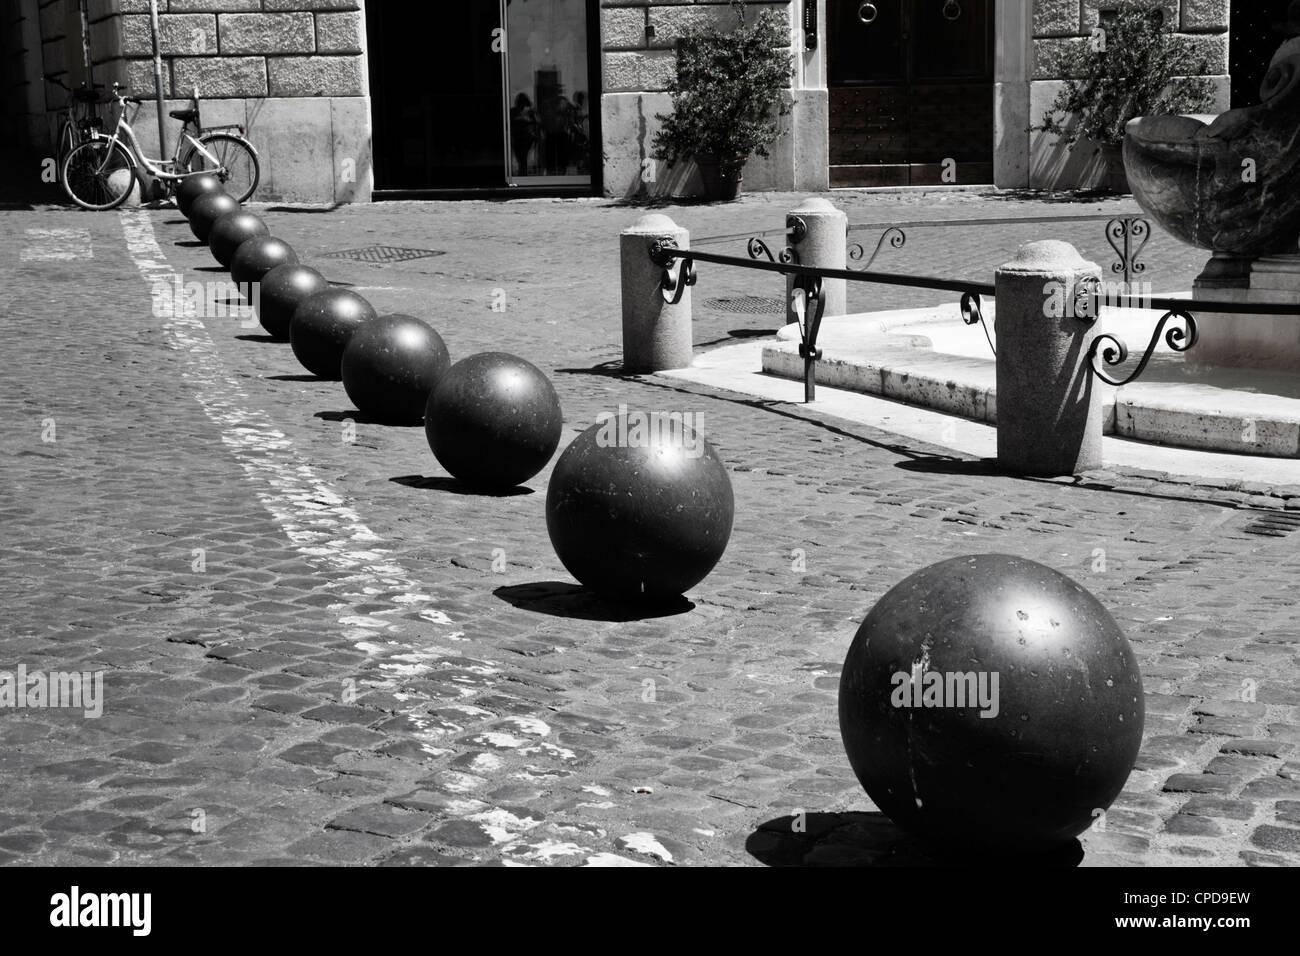 Street furniture, row of metal balls marking side of street. - Stock Image